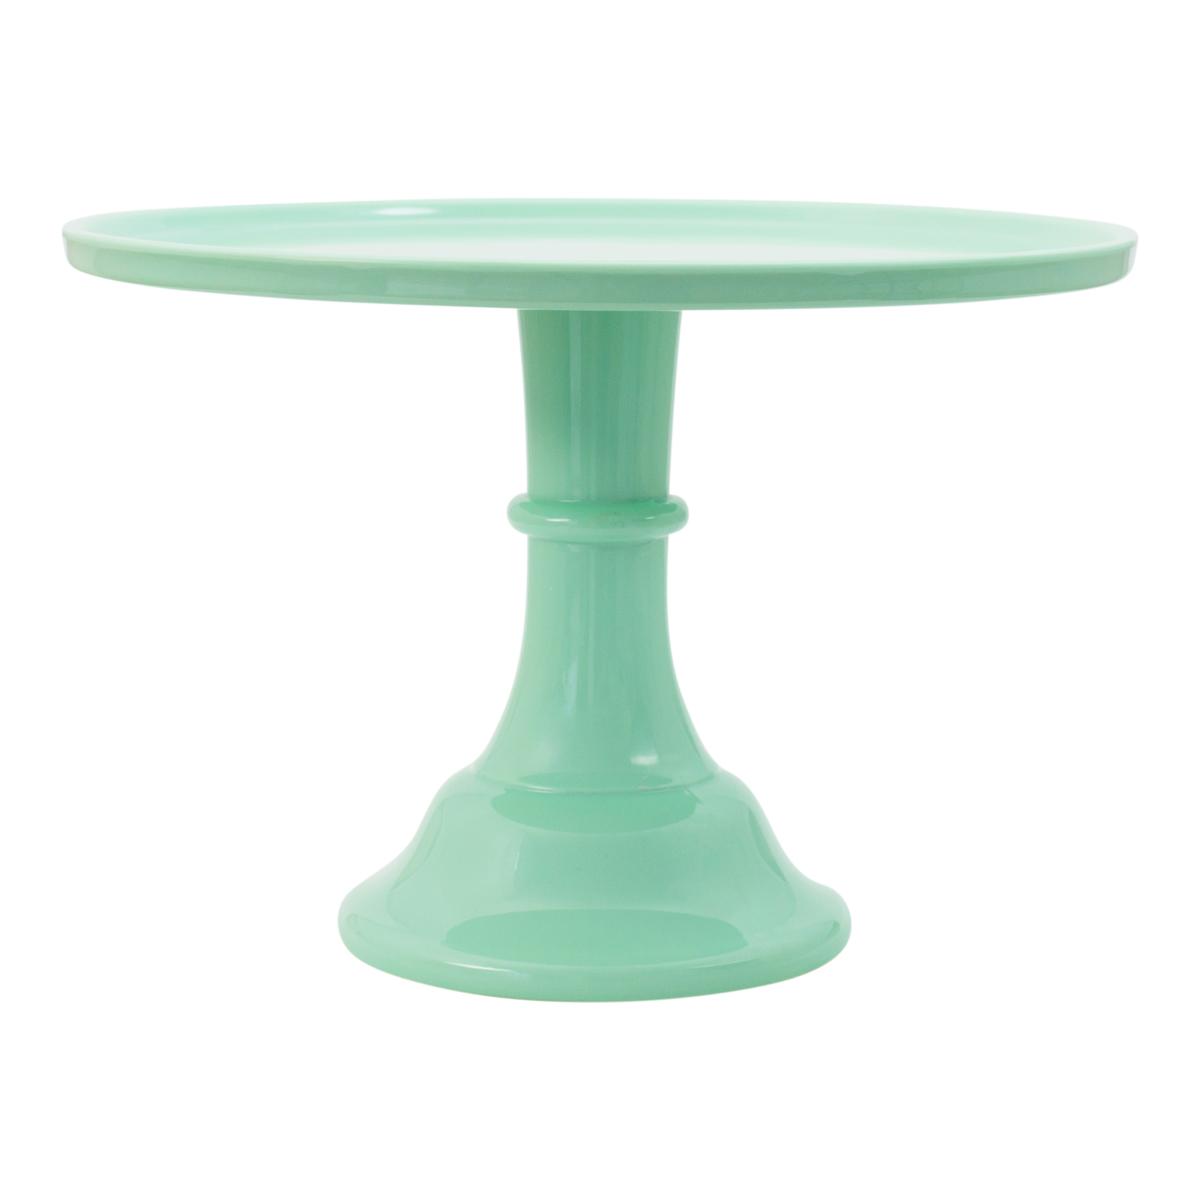 Imagen de producto: https://tienda.postreadiccion.com/img/articulos/secundarias13007-stand-verde-menta-de-melamina-29-cm-1.jpg